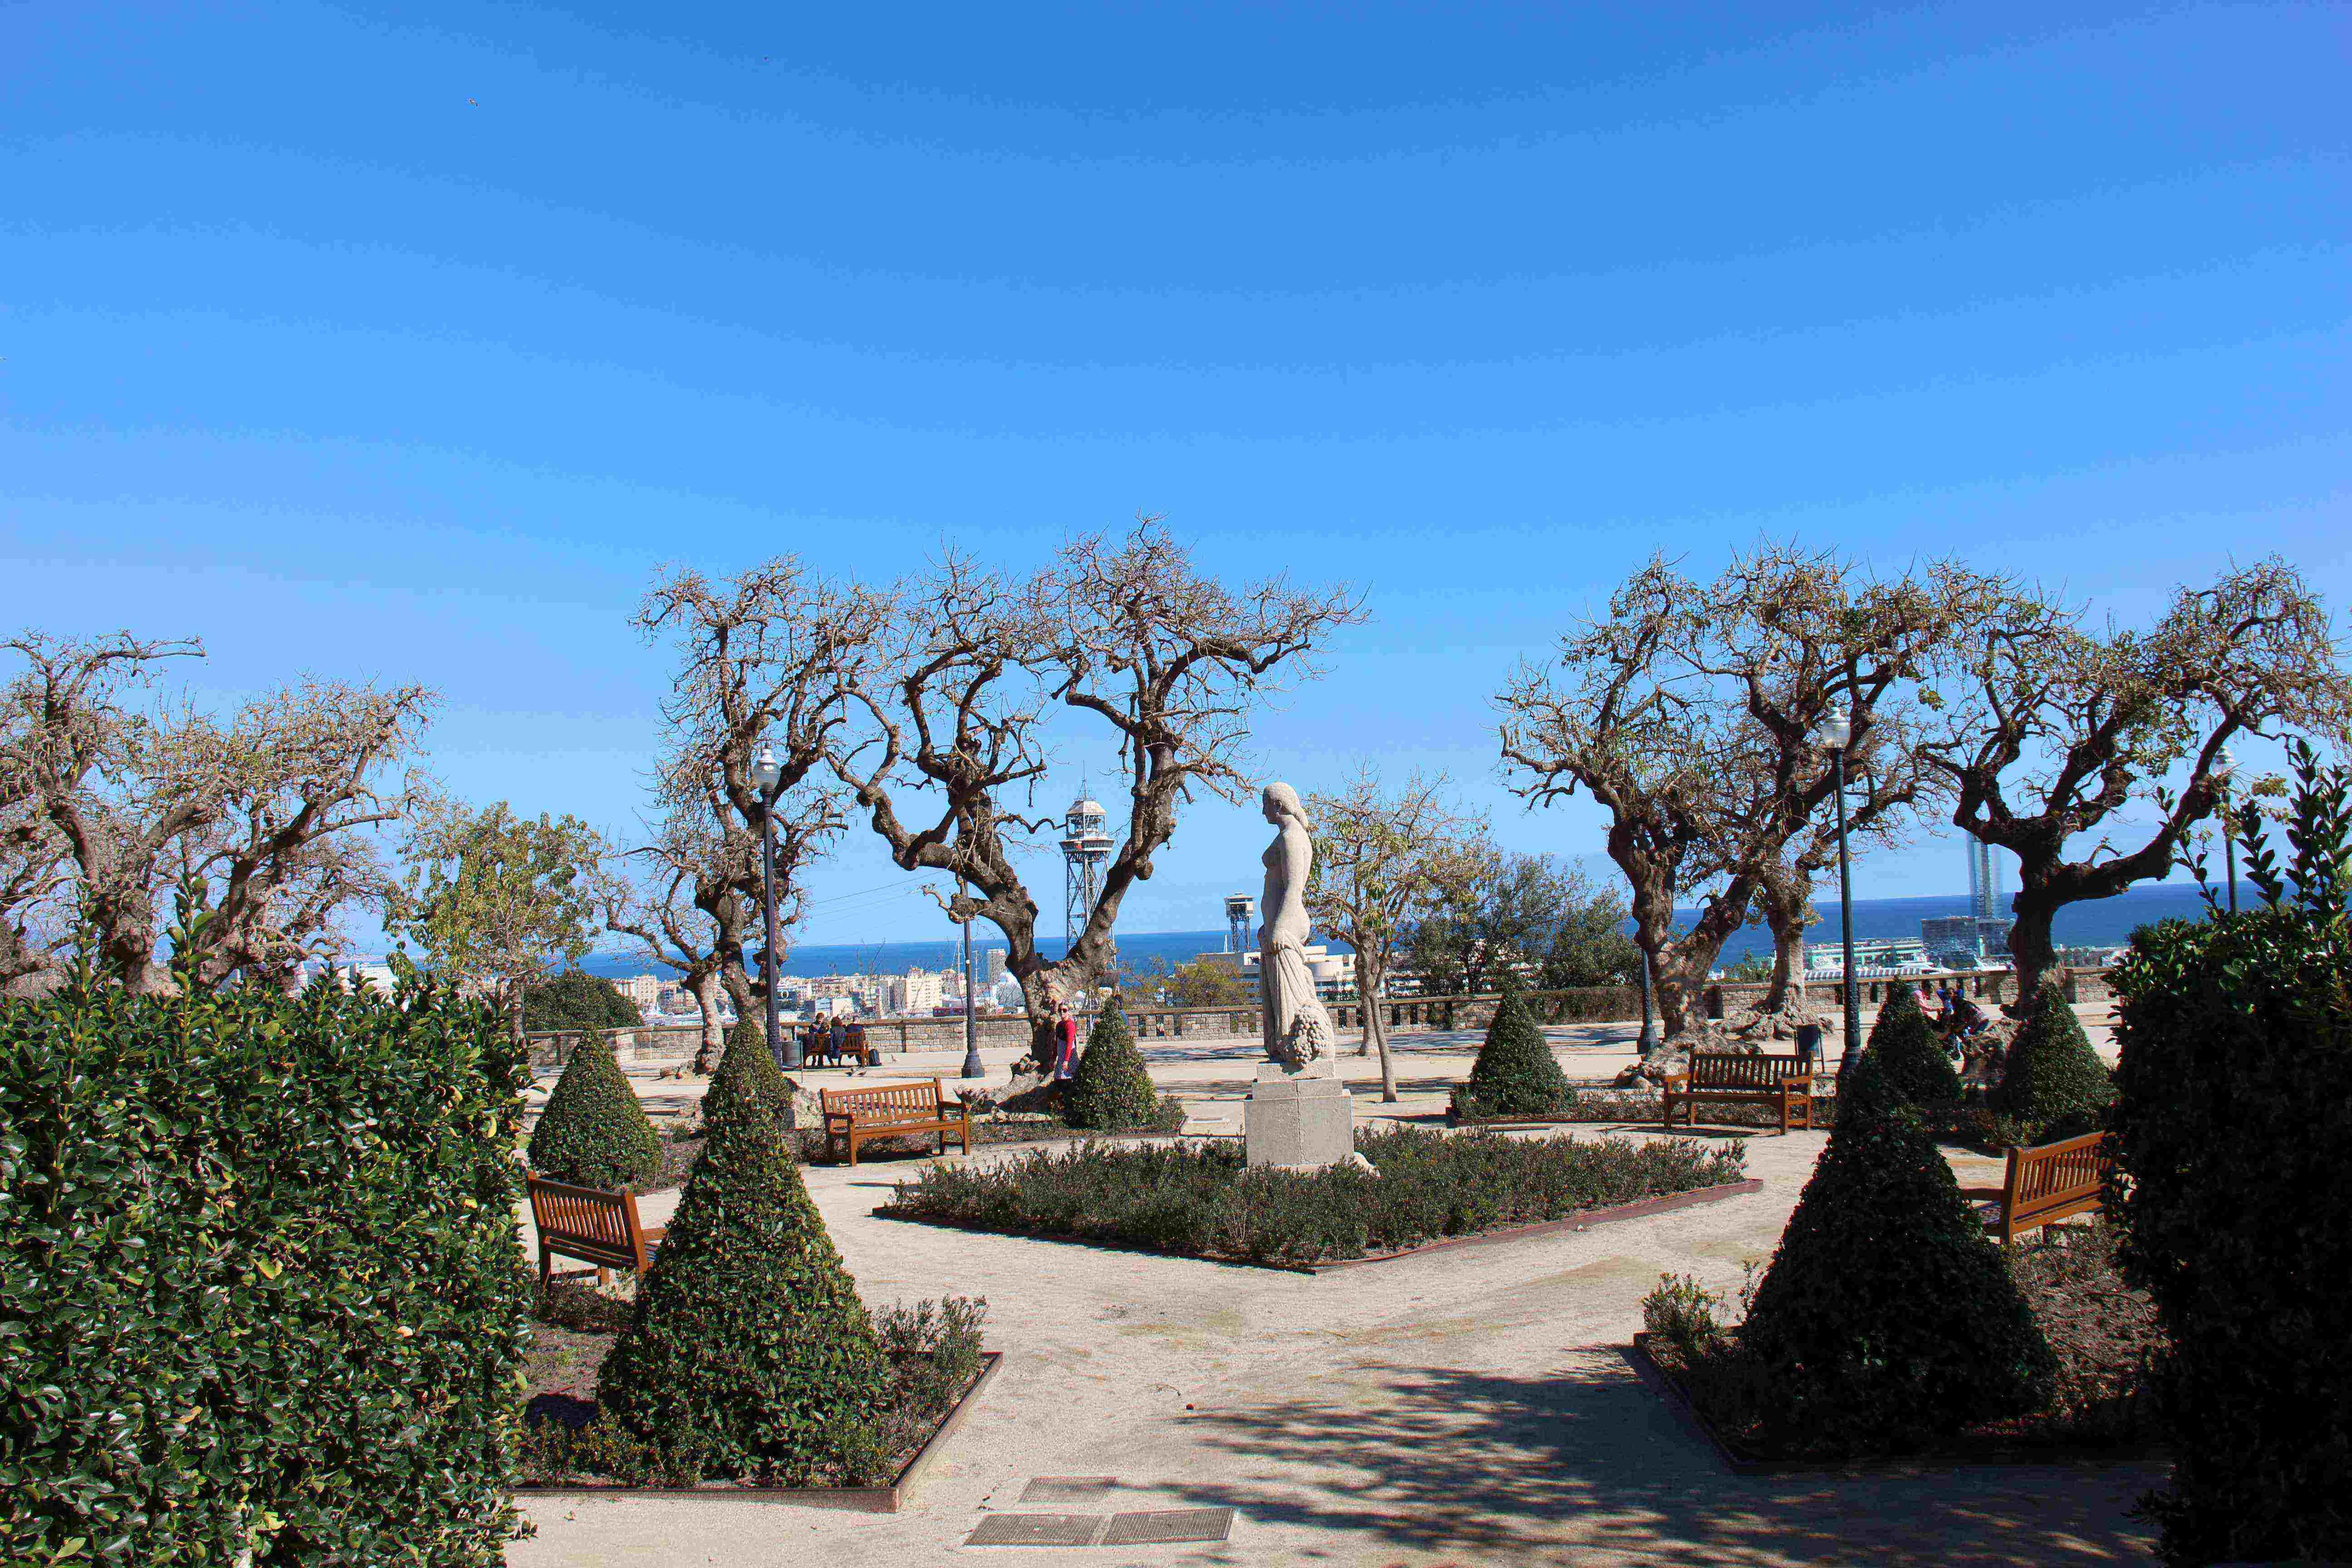 Forestier a montju c el jard n como obra de arte castell de montju c - Jardines de montjuic ...